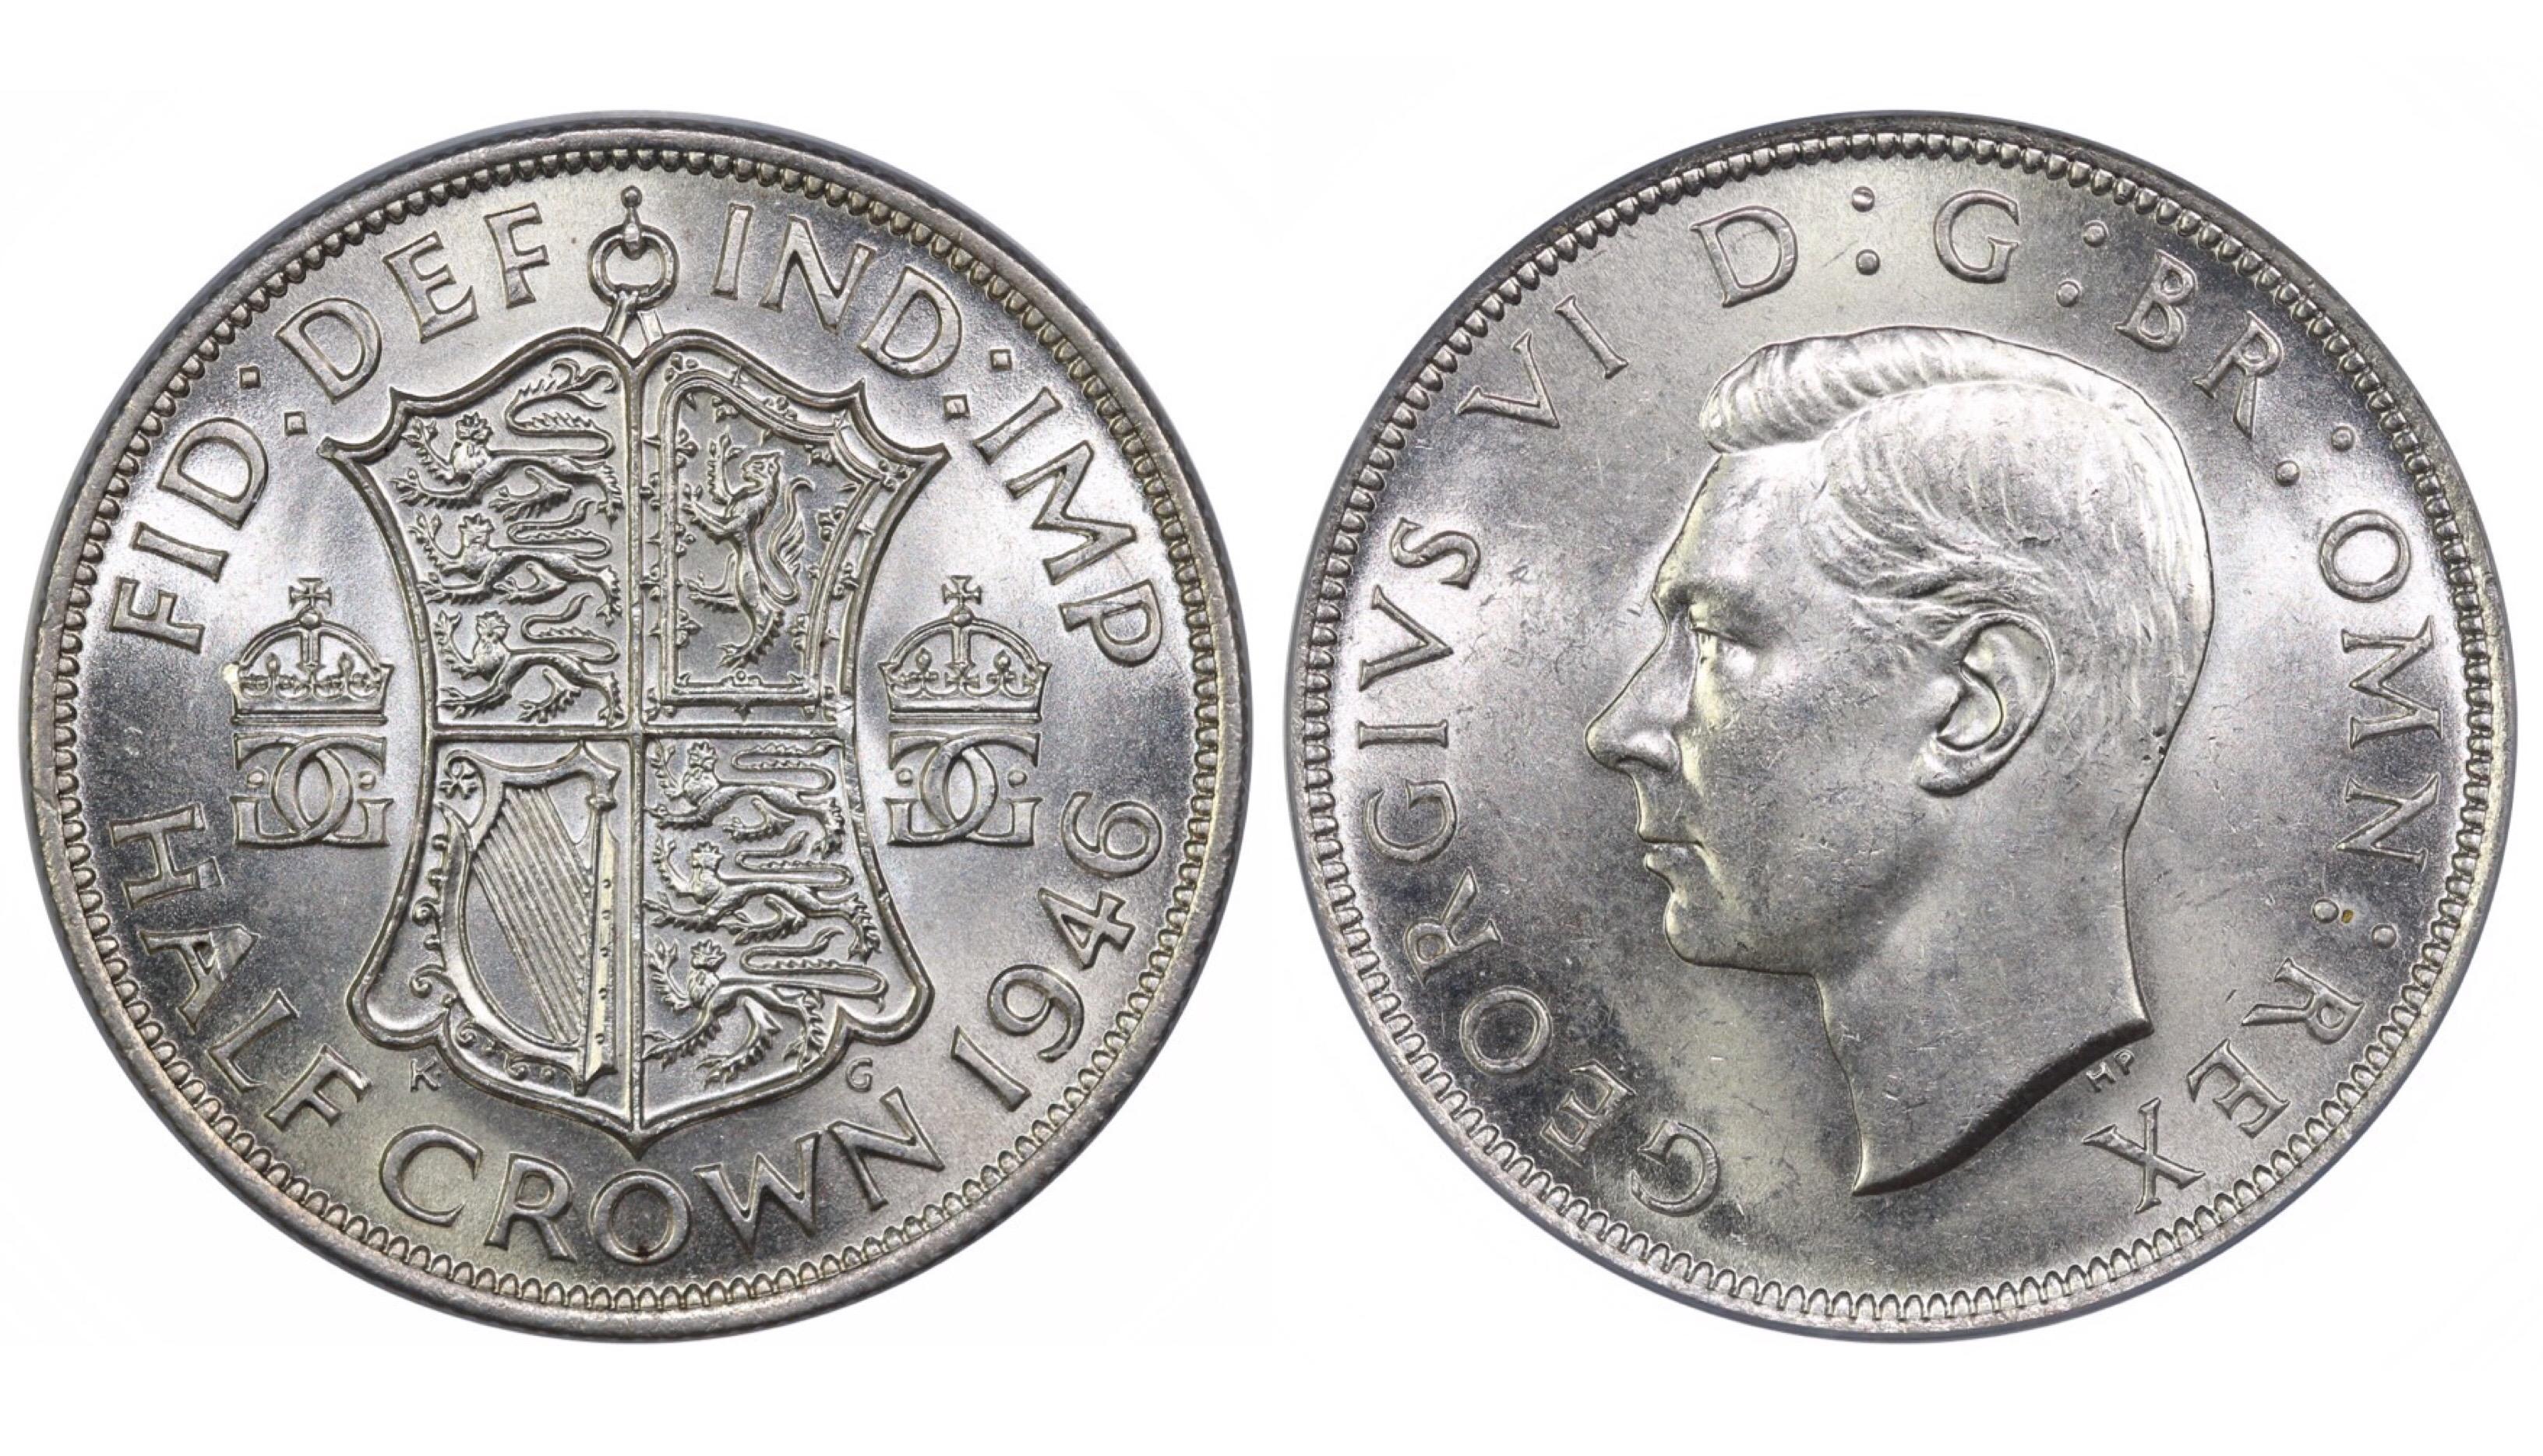 1946 Halfcrown, CGS 75, George VI, ESC 796, UIN 23812